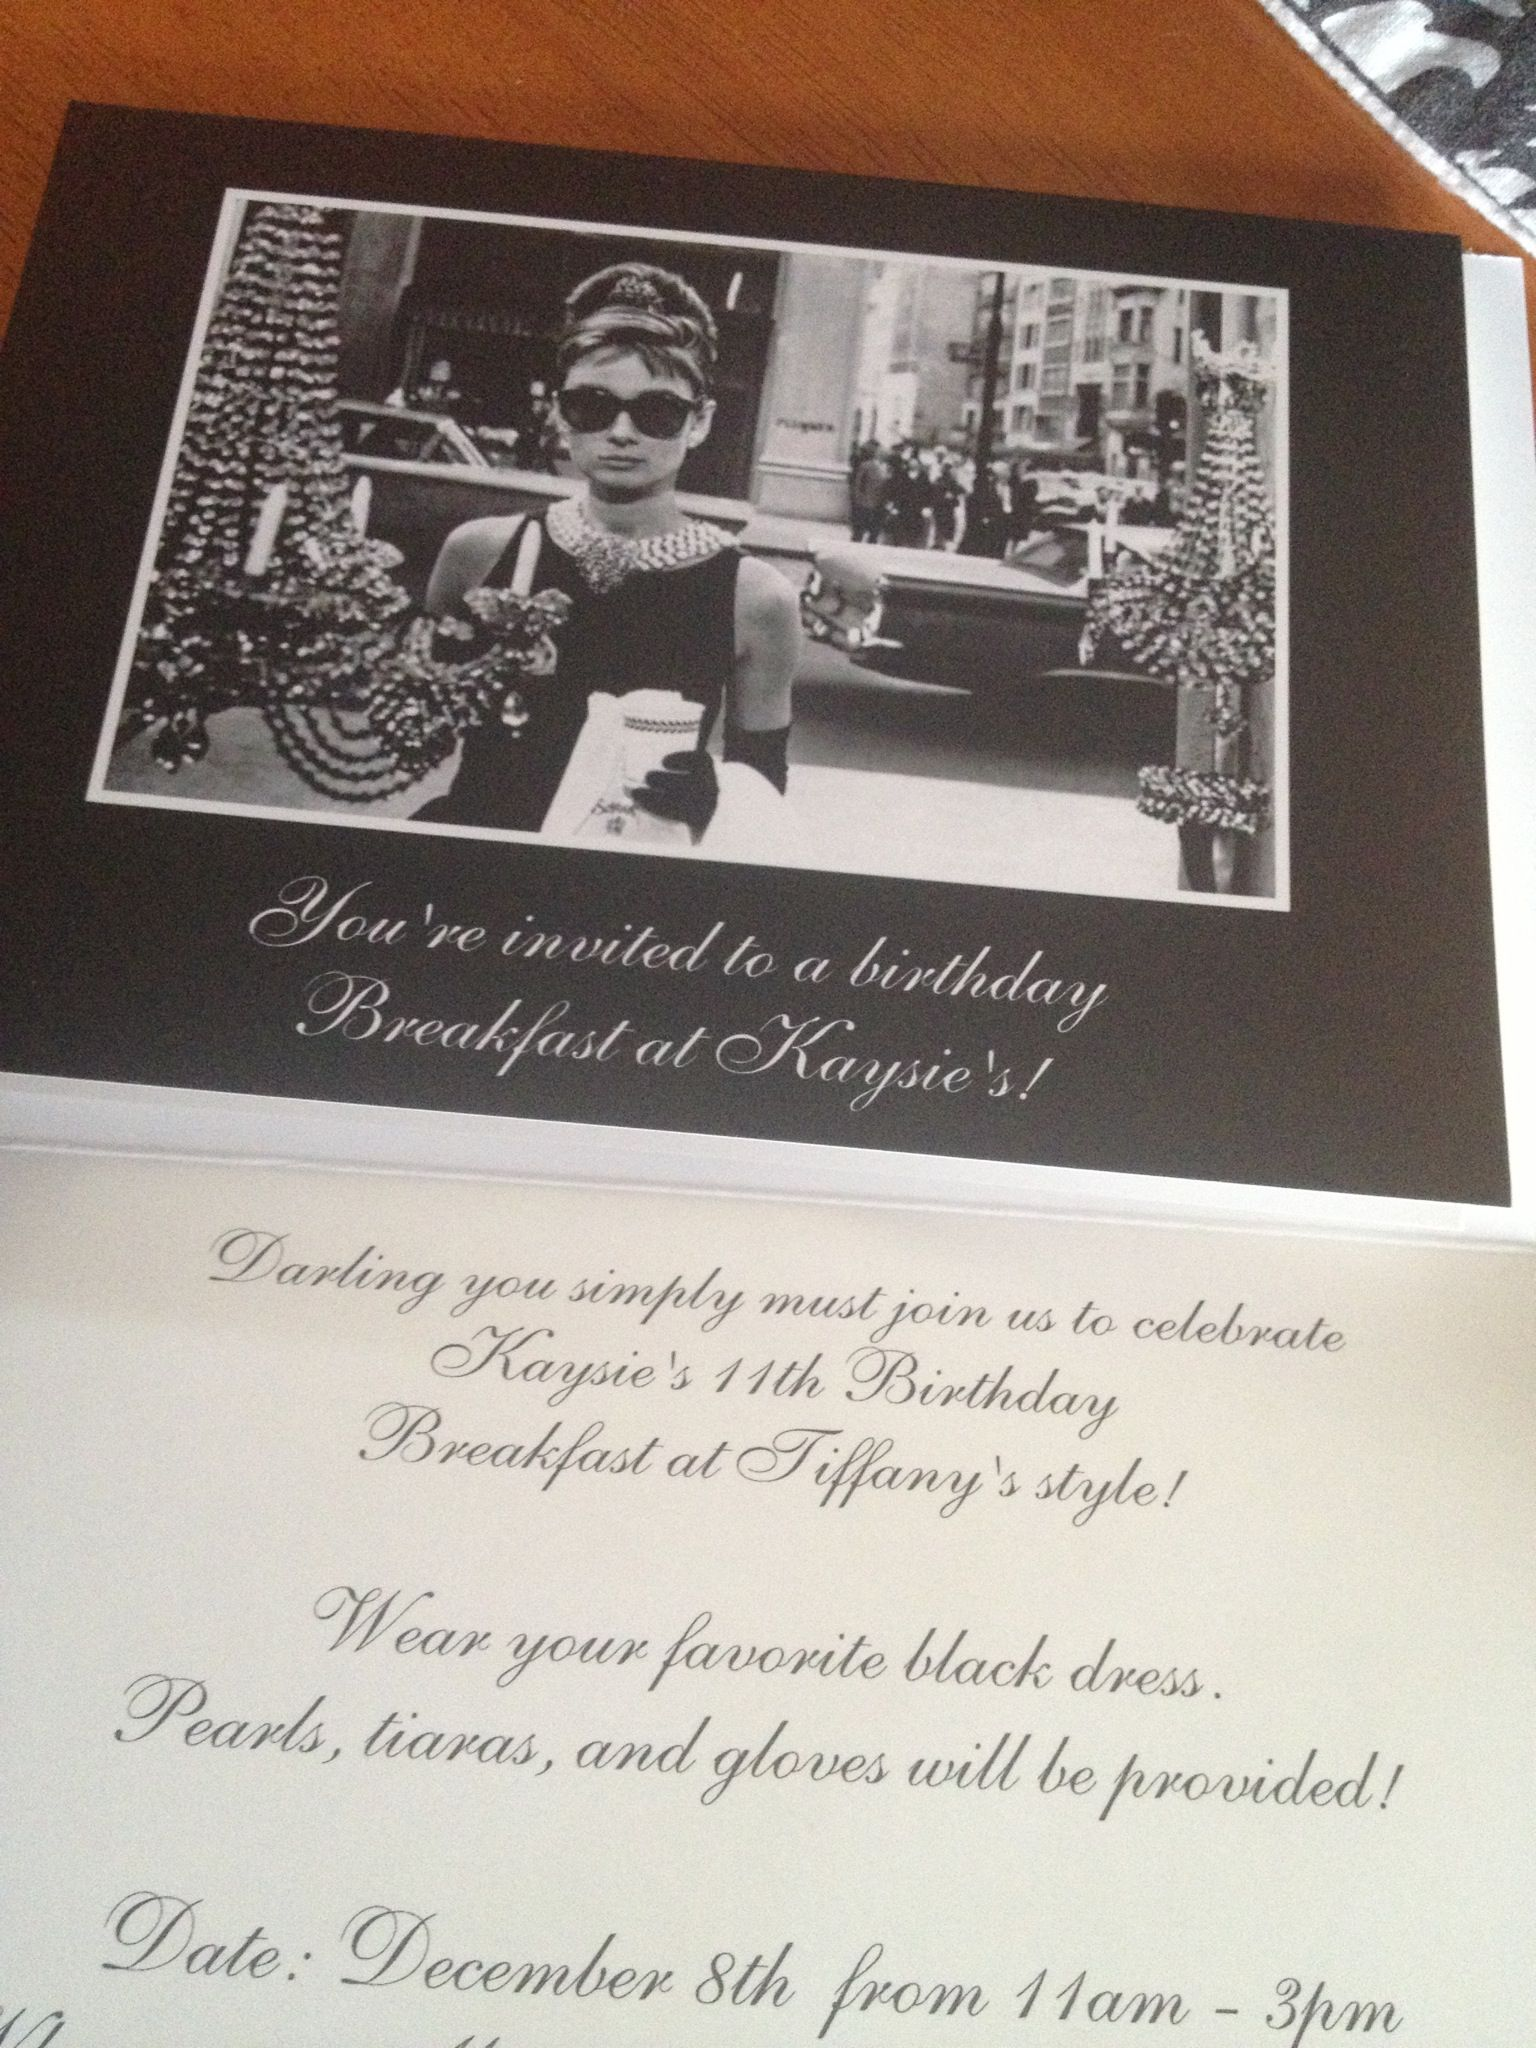 Breakfast At Tiffany S Theme Birthday Party Invitations Shutterfly